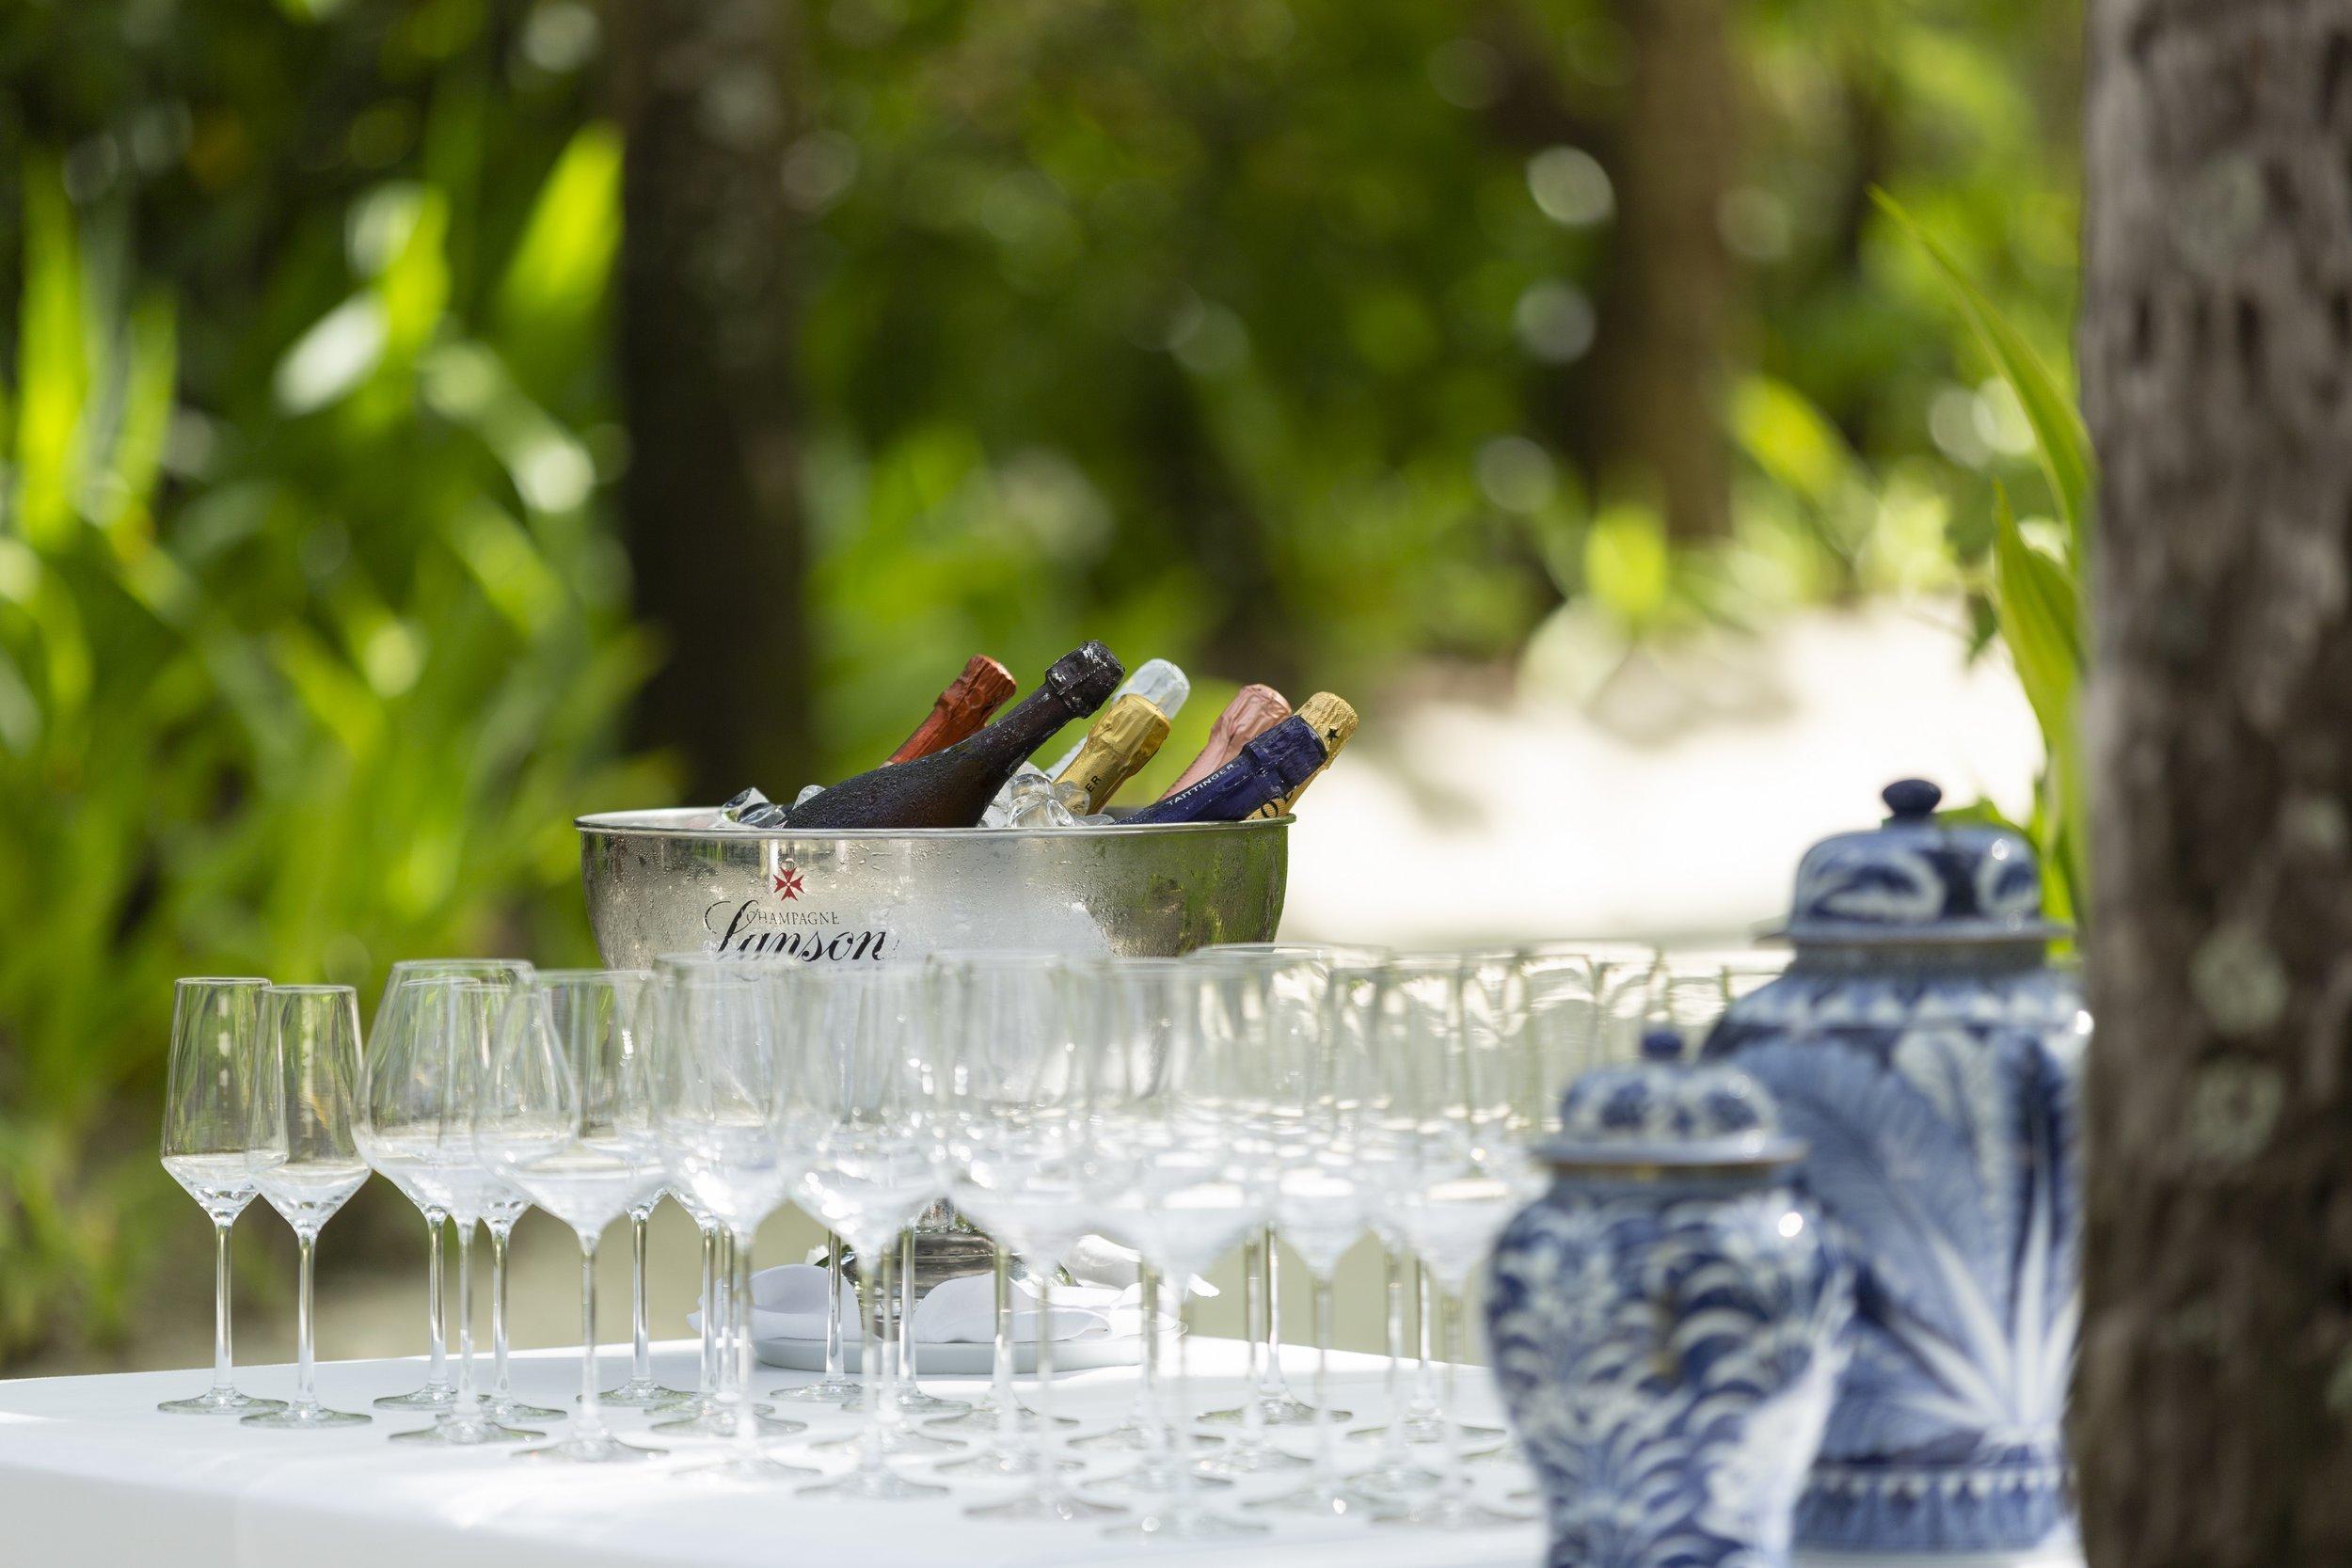 Naladhu_Private_Island_Coconut_Grove_Cocktail_Party_Glasses.jpg